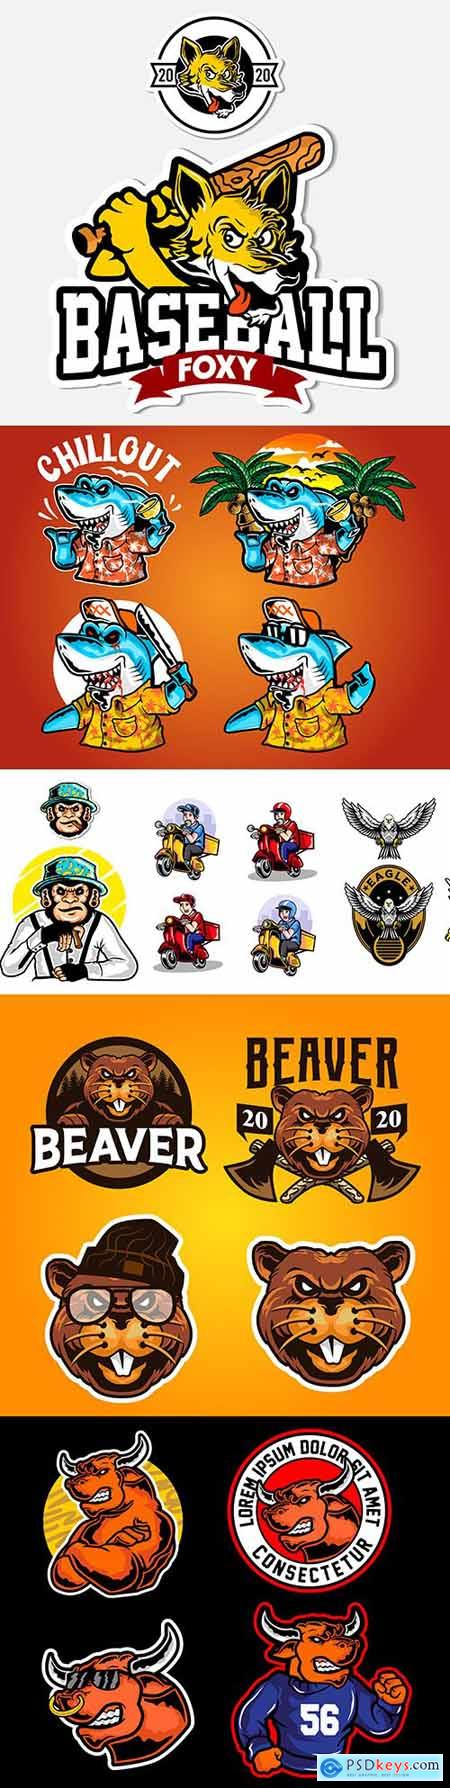 Emblem animal comics mascot design illustration